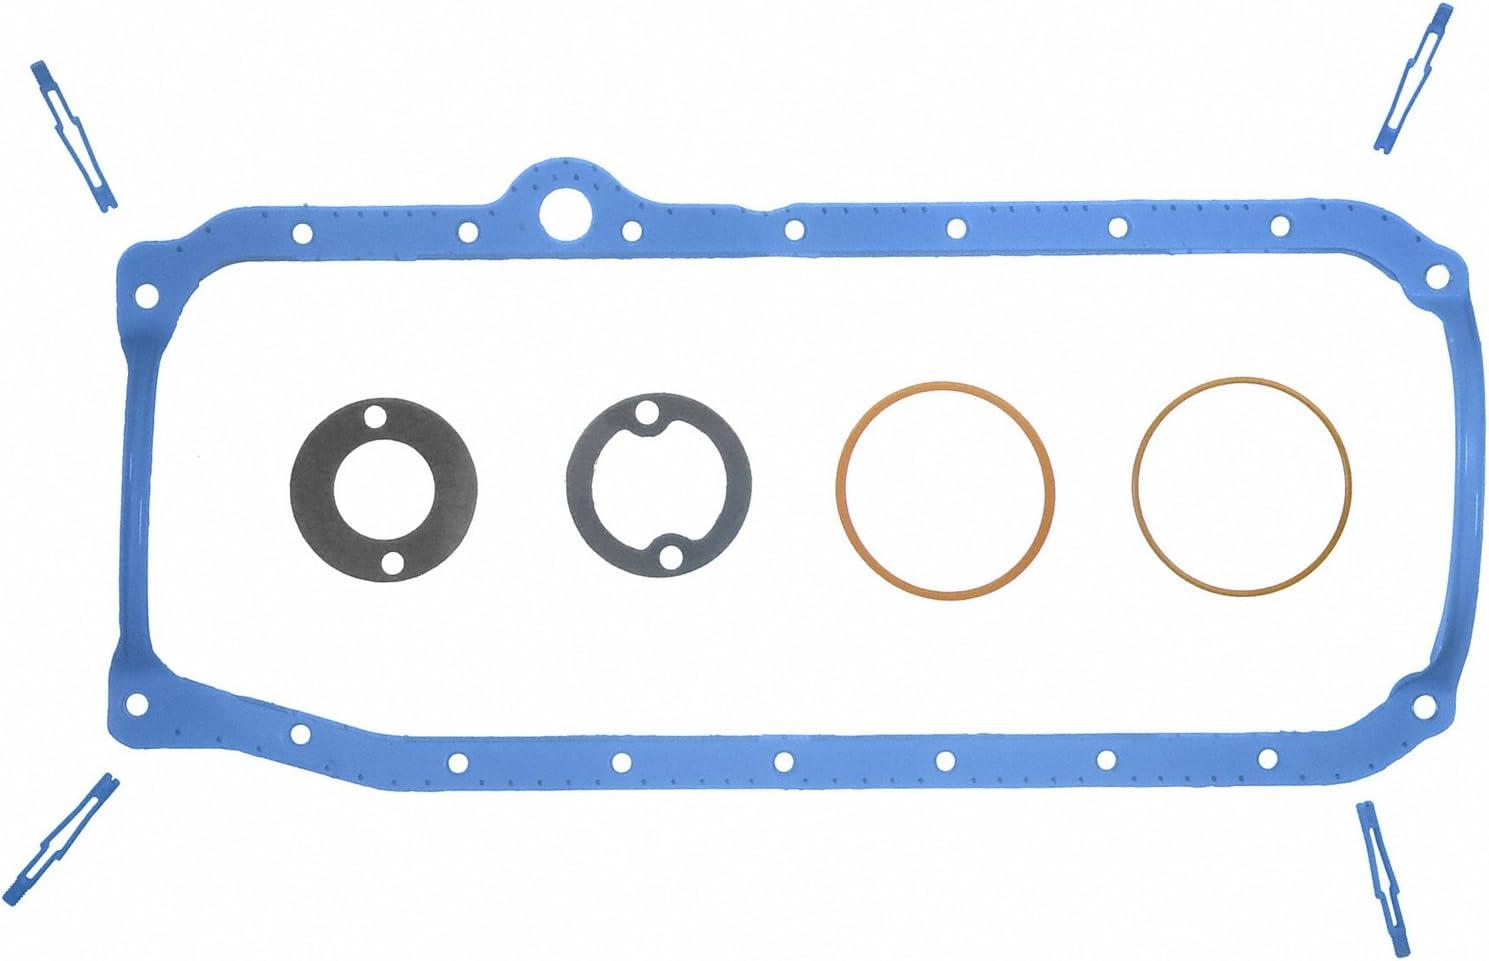 Fel-Pro OS 4434 C Oil Pan Gasket Set